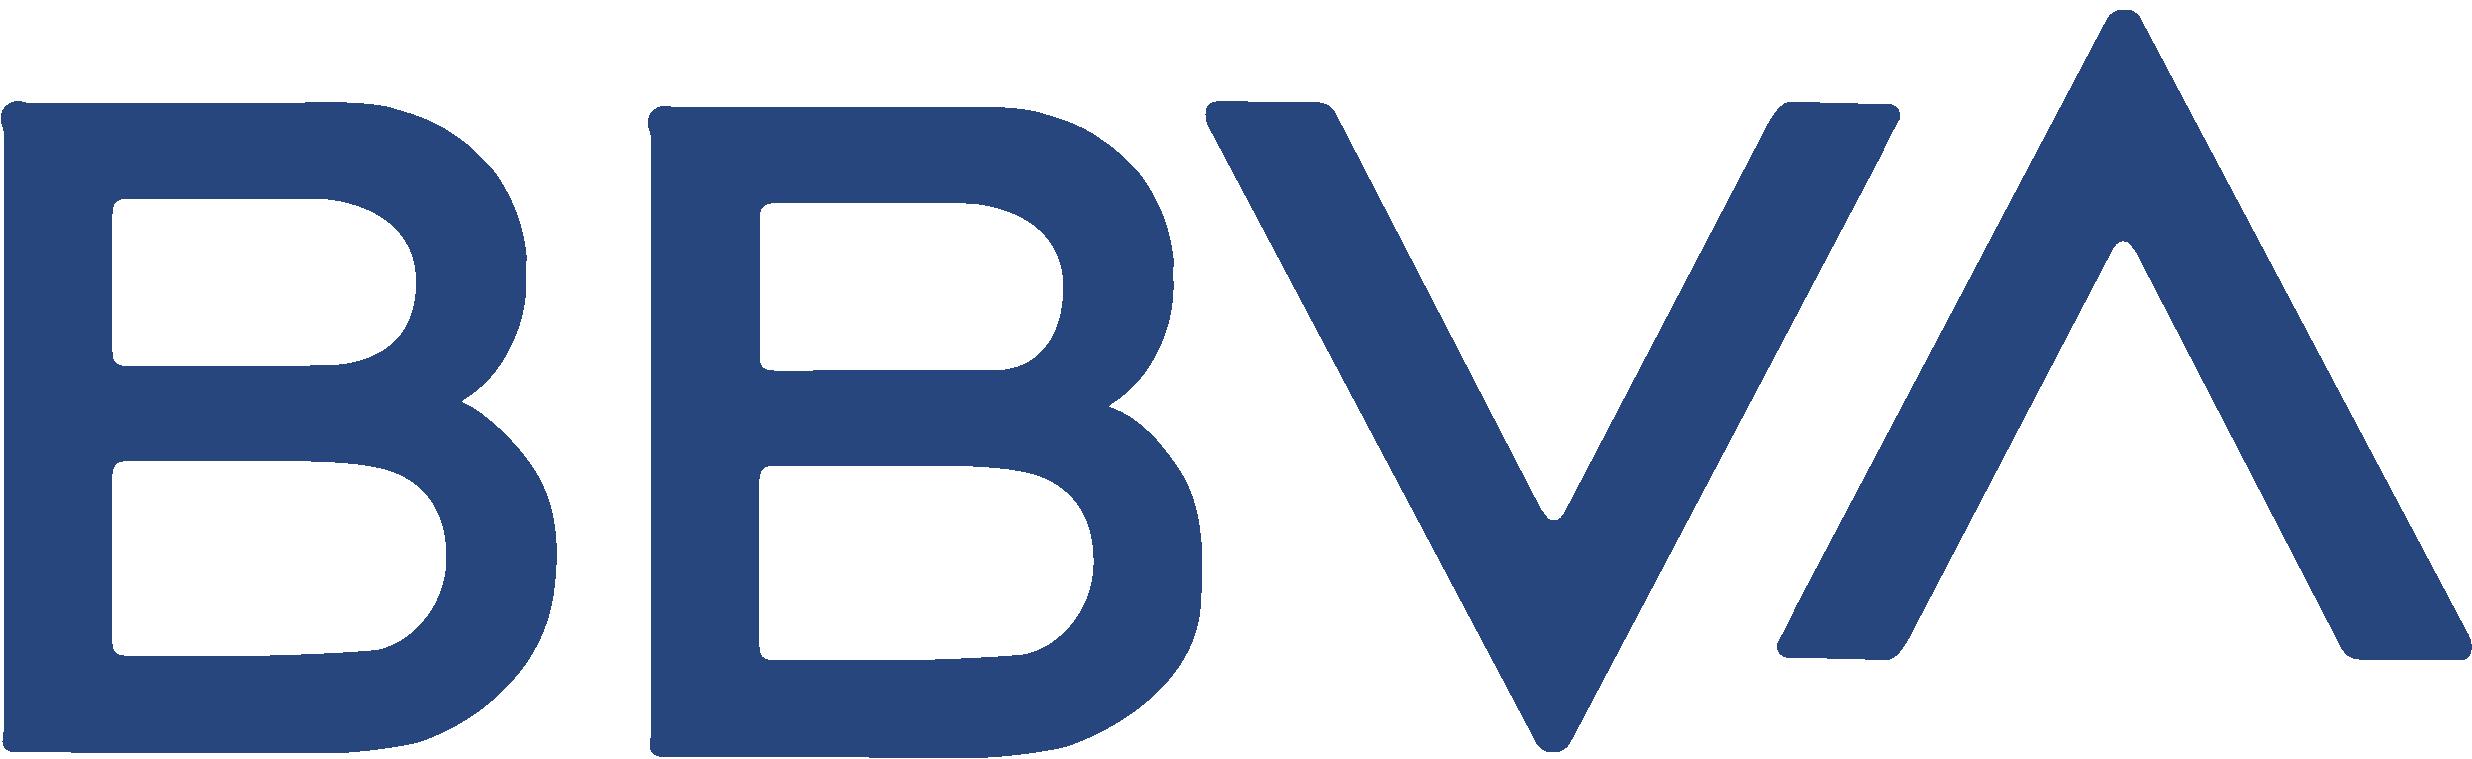 logo bbva operaciones interbancarias securex